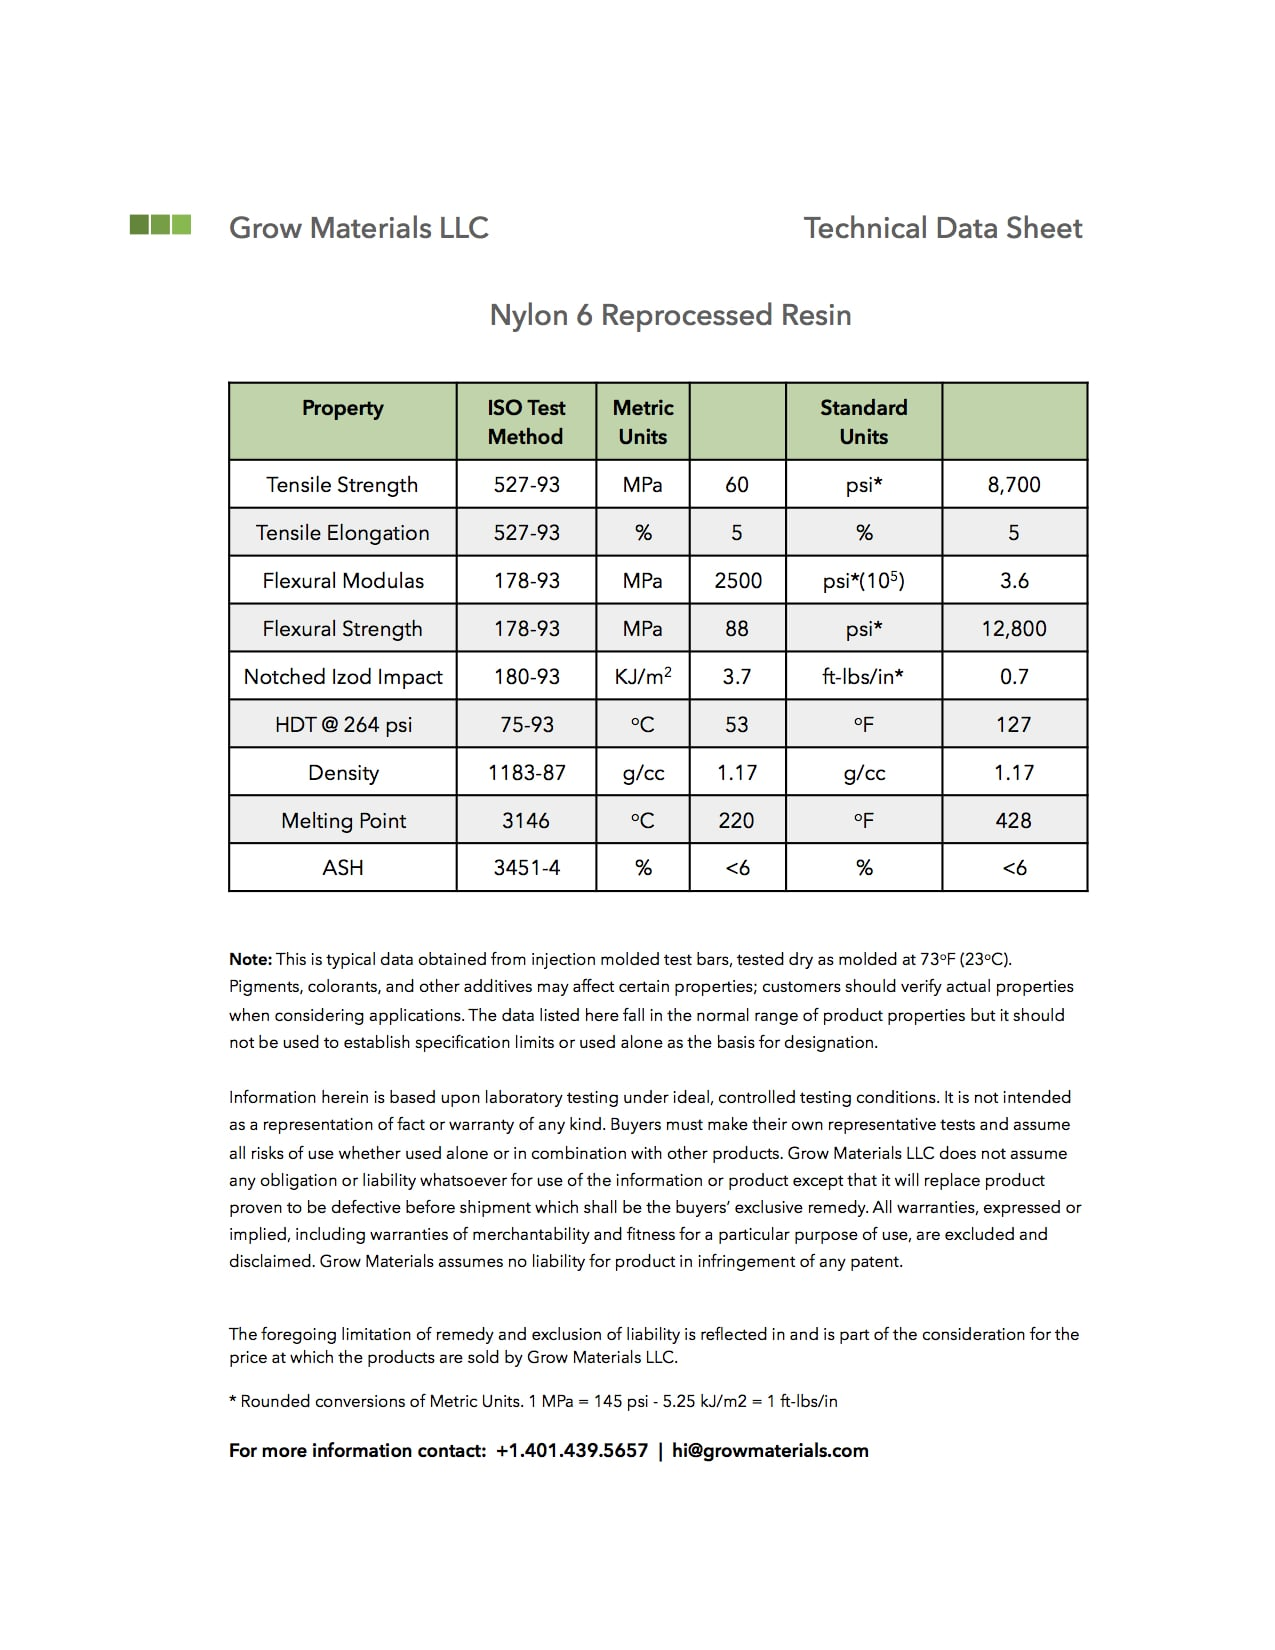 Grow Materials TDS-Nylon 6 PCR.jpg